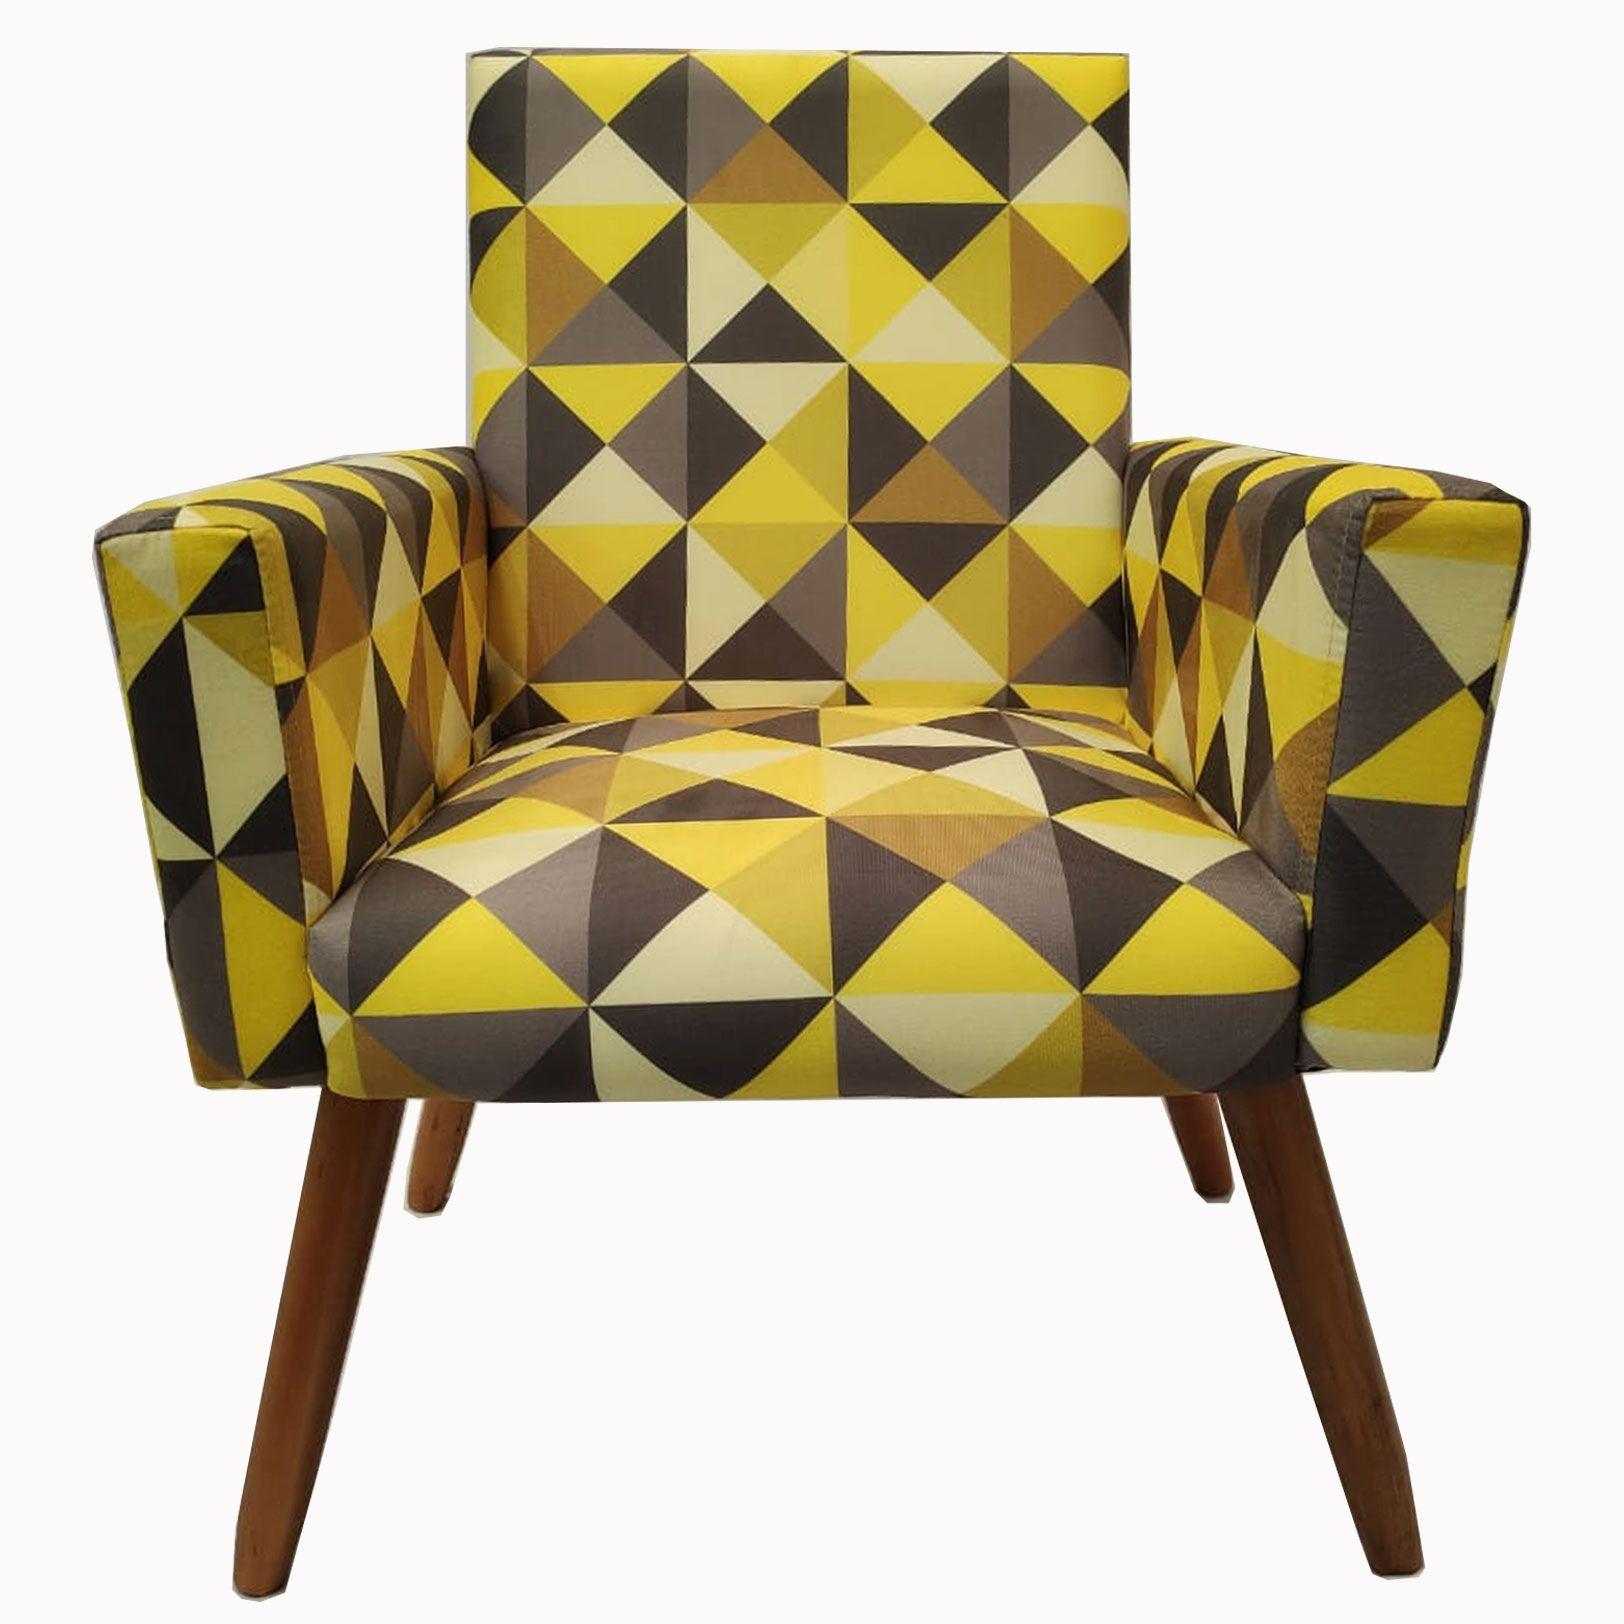 Poltrona Decorativa Nina Pé Palito Estampa Triângulo Amarelo